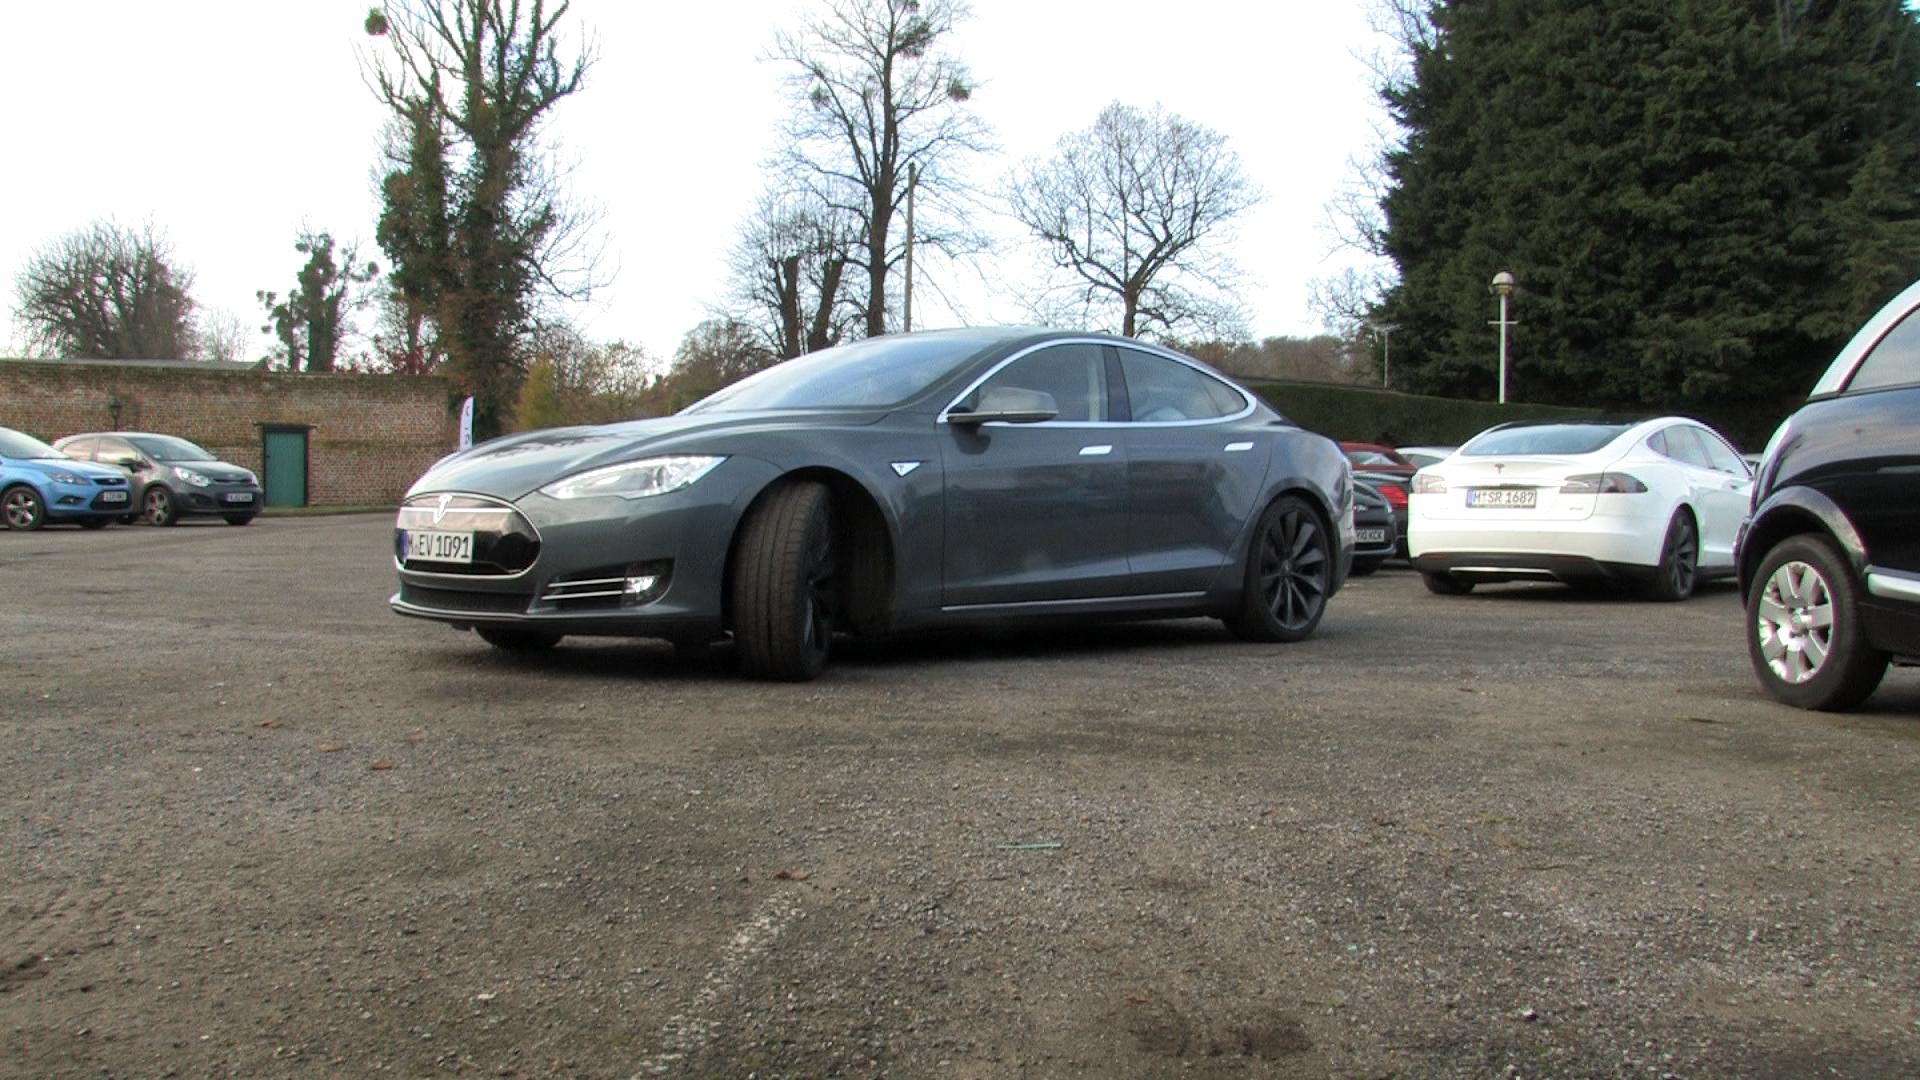 Fleetdrive_Tesla_Model_S_testdrive